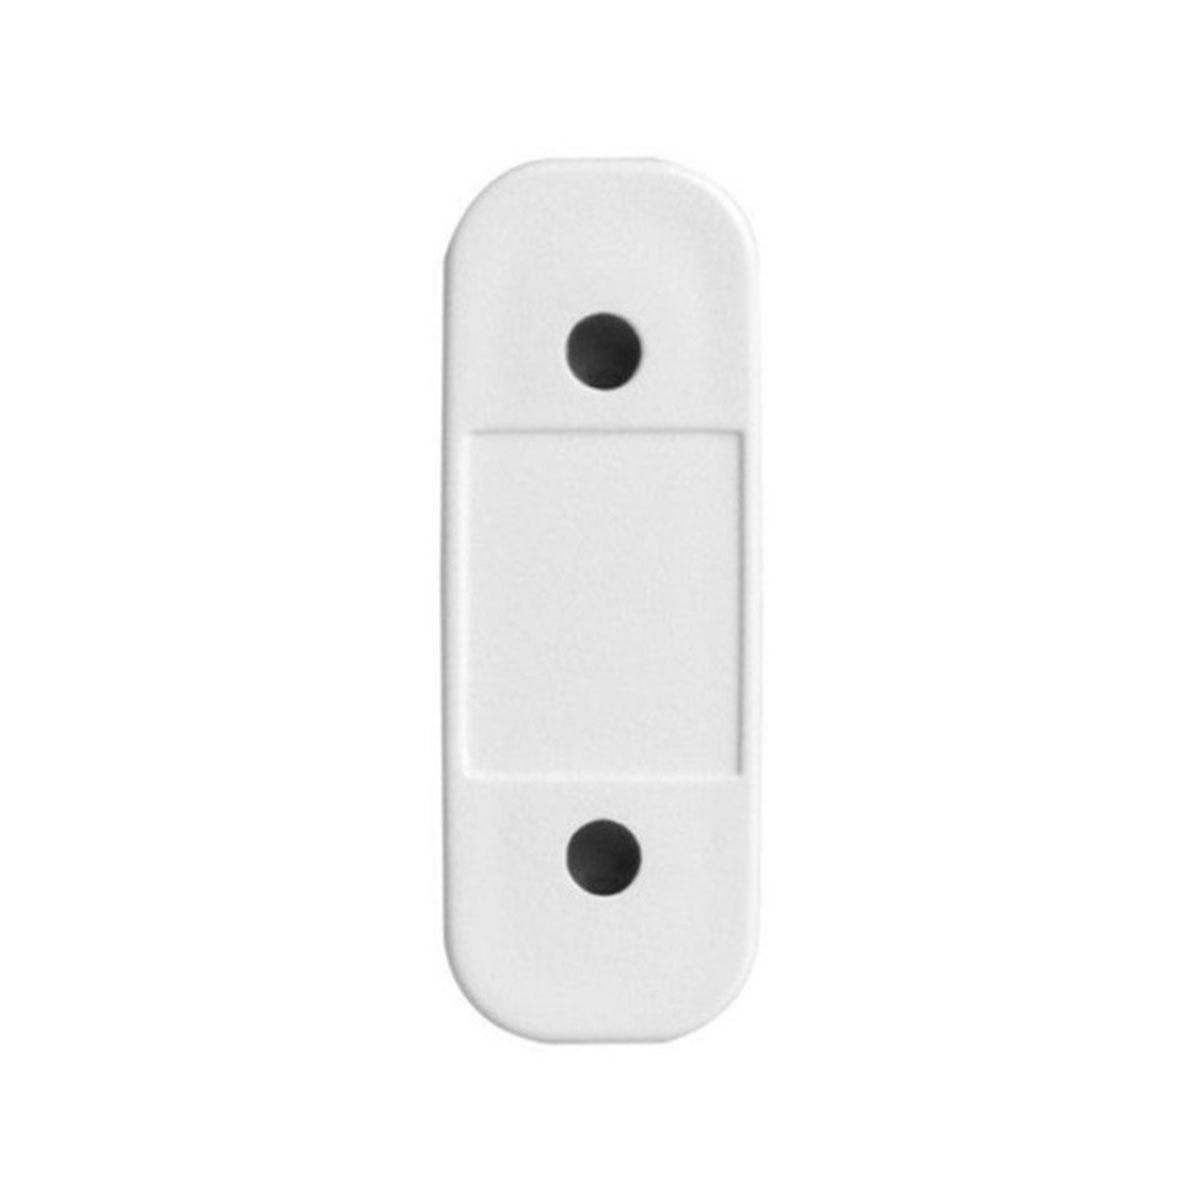 Kit 04 Sensor Magnético Sem Fio Intelbras Xas Light Branco